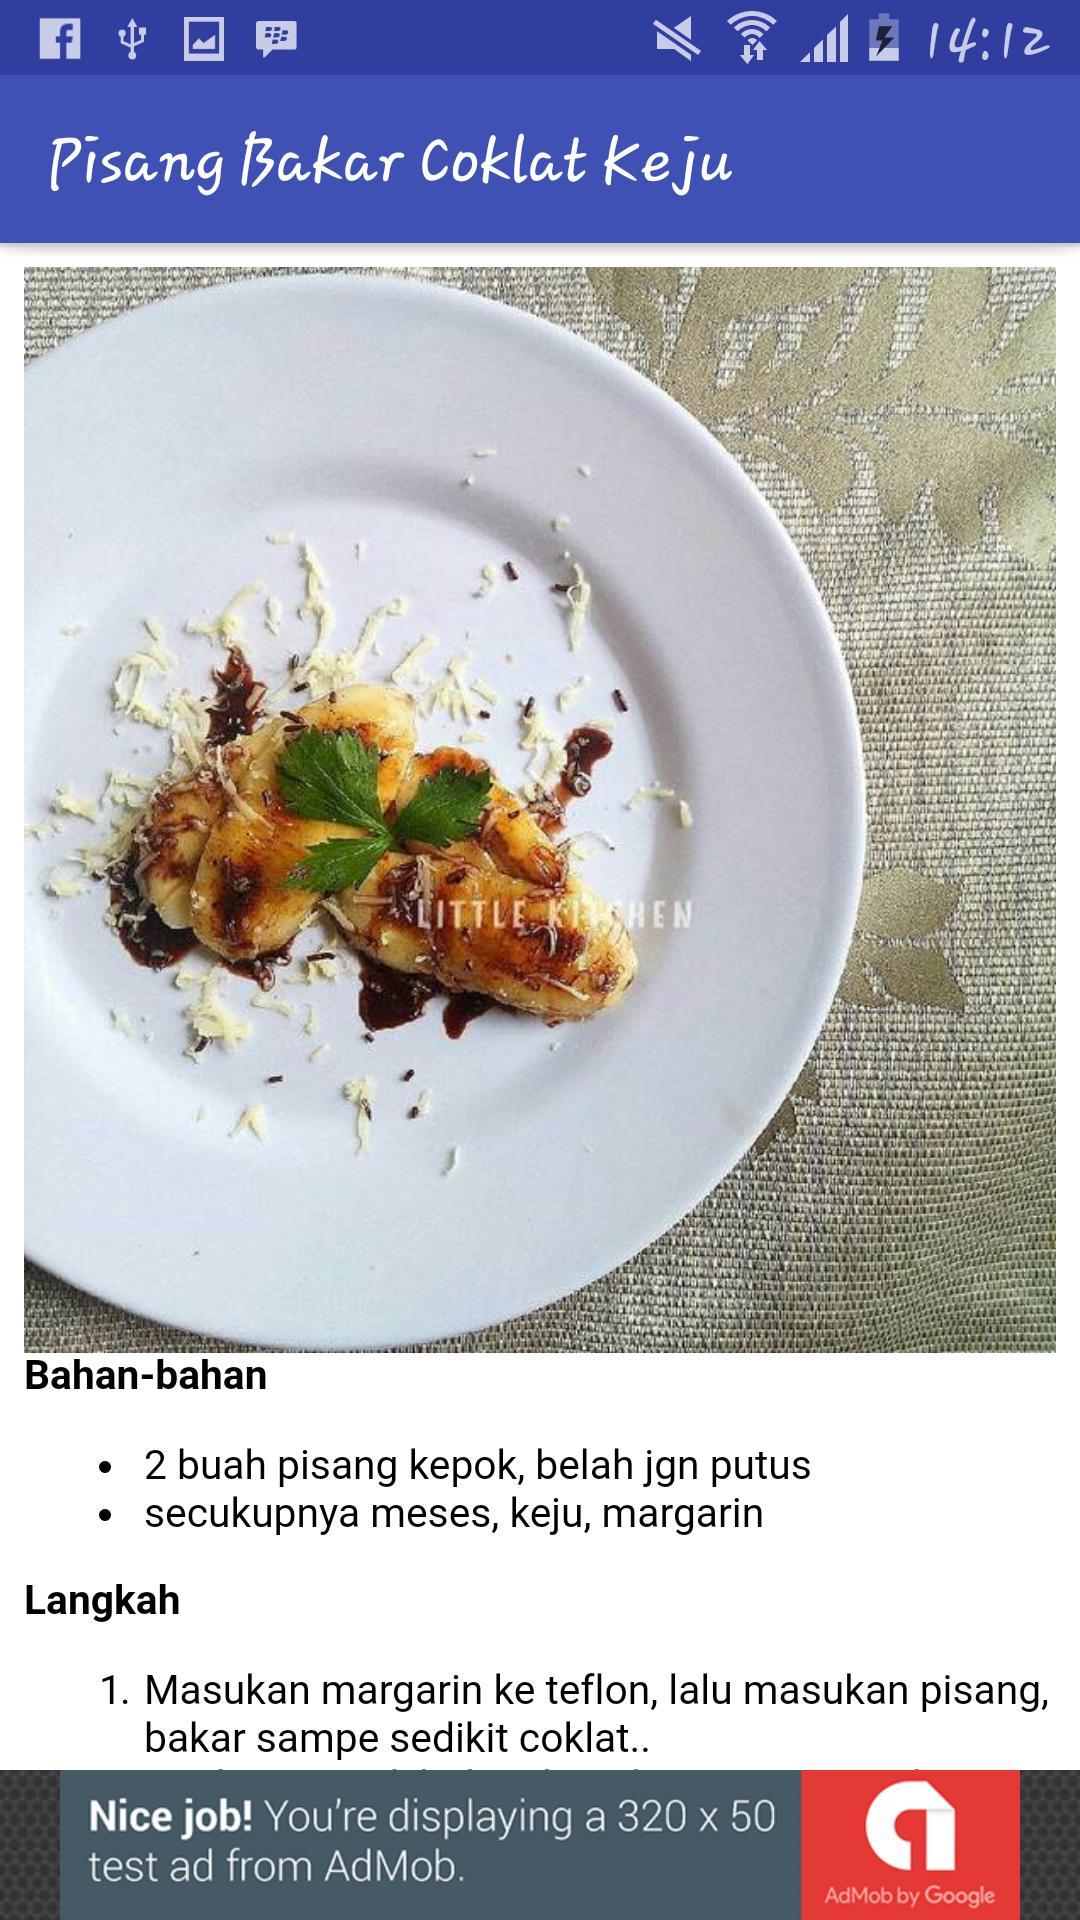 Aplikasi Resep Masakan Ala Indonesia For Android Apk Download